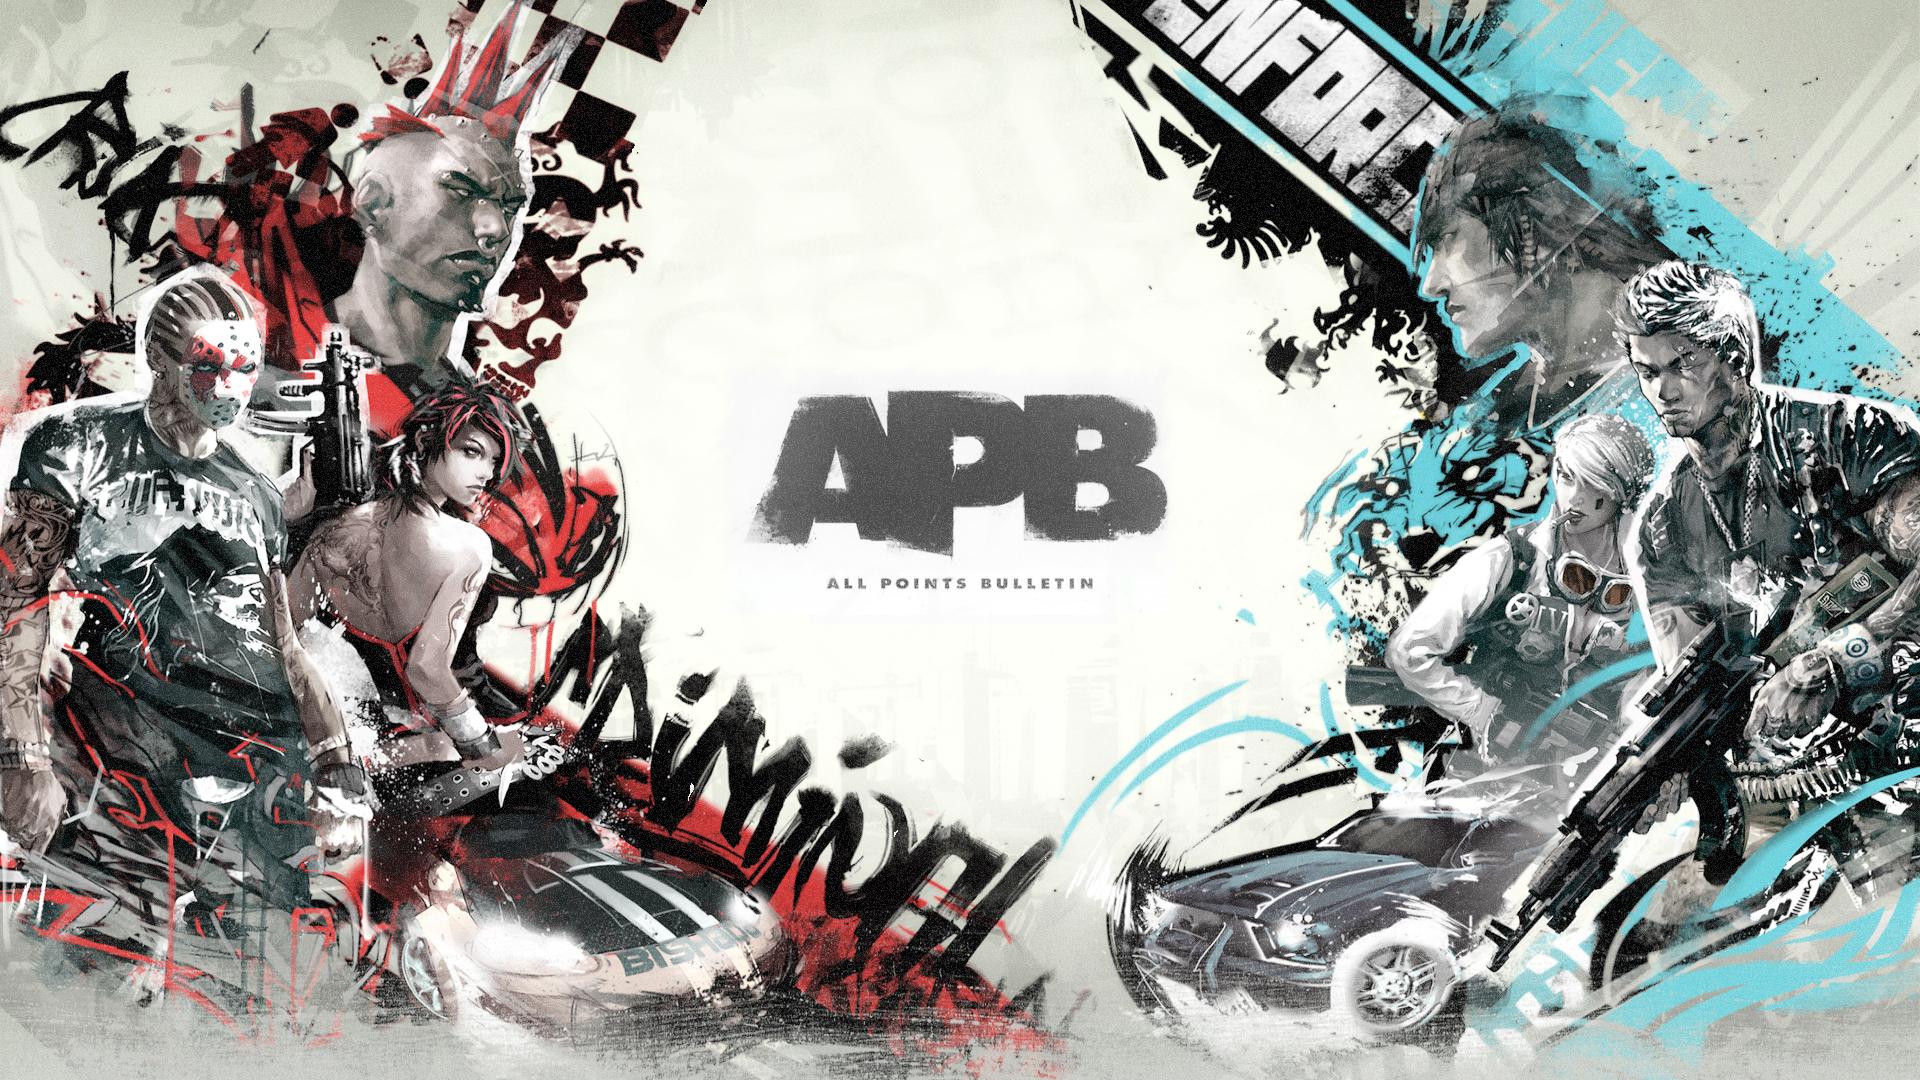 apb_1920x1080_combination_by_jackknife35.jpg